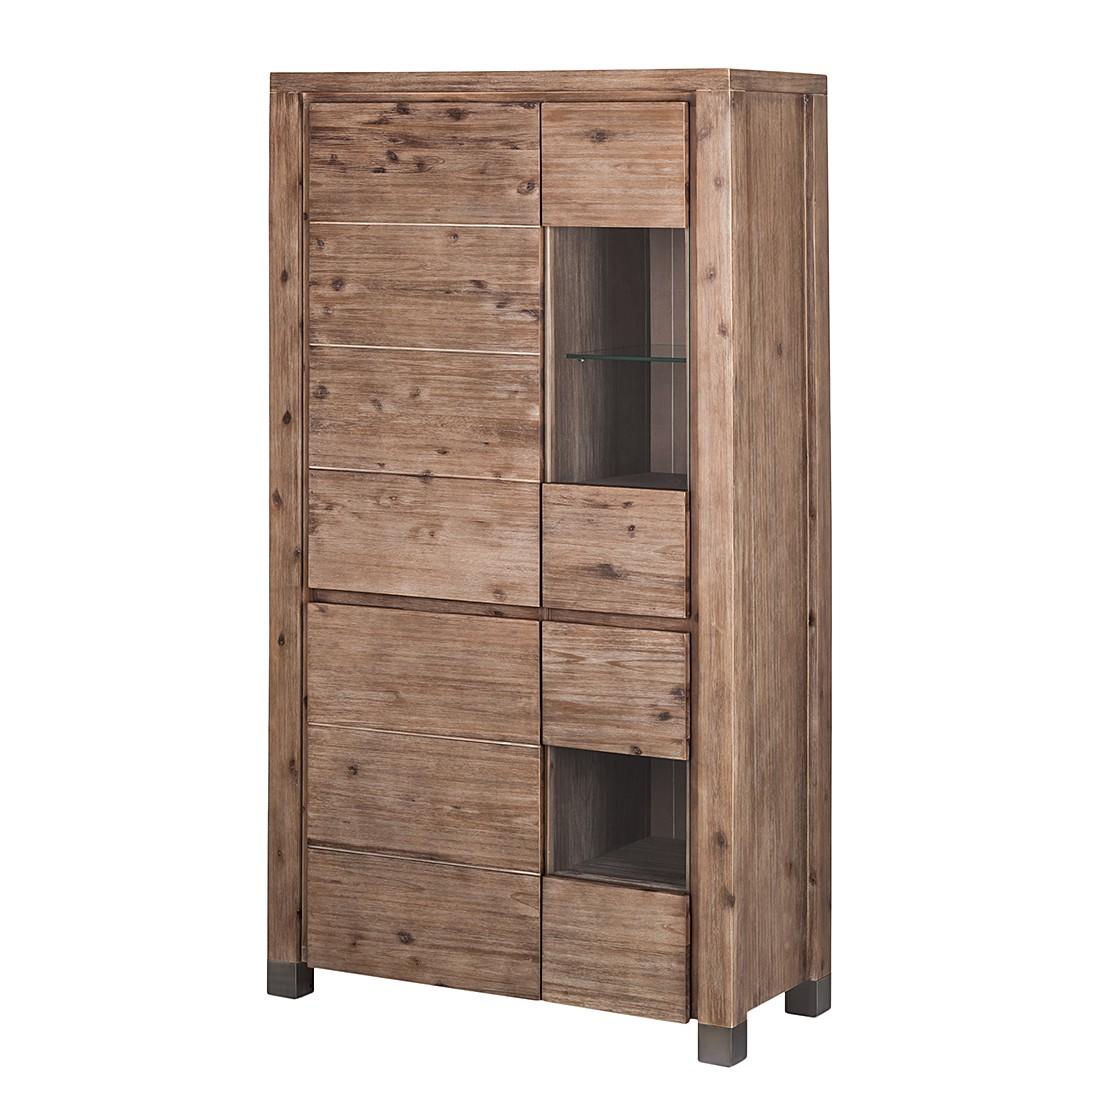 highboard delia akazie massiv braun highboard delia. Black Bedroom Furniture Sets. Home Design Ideas